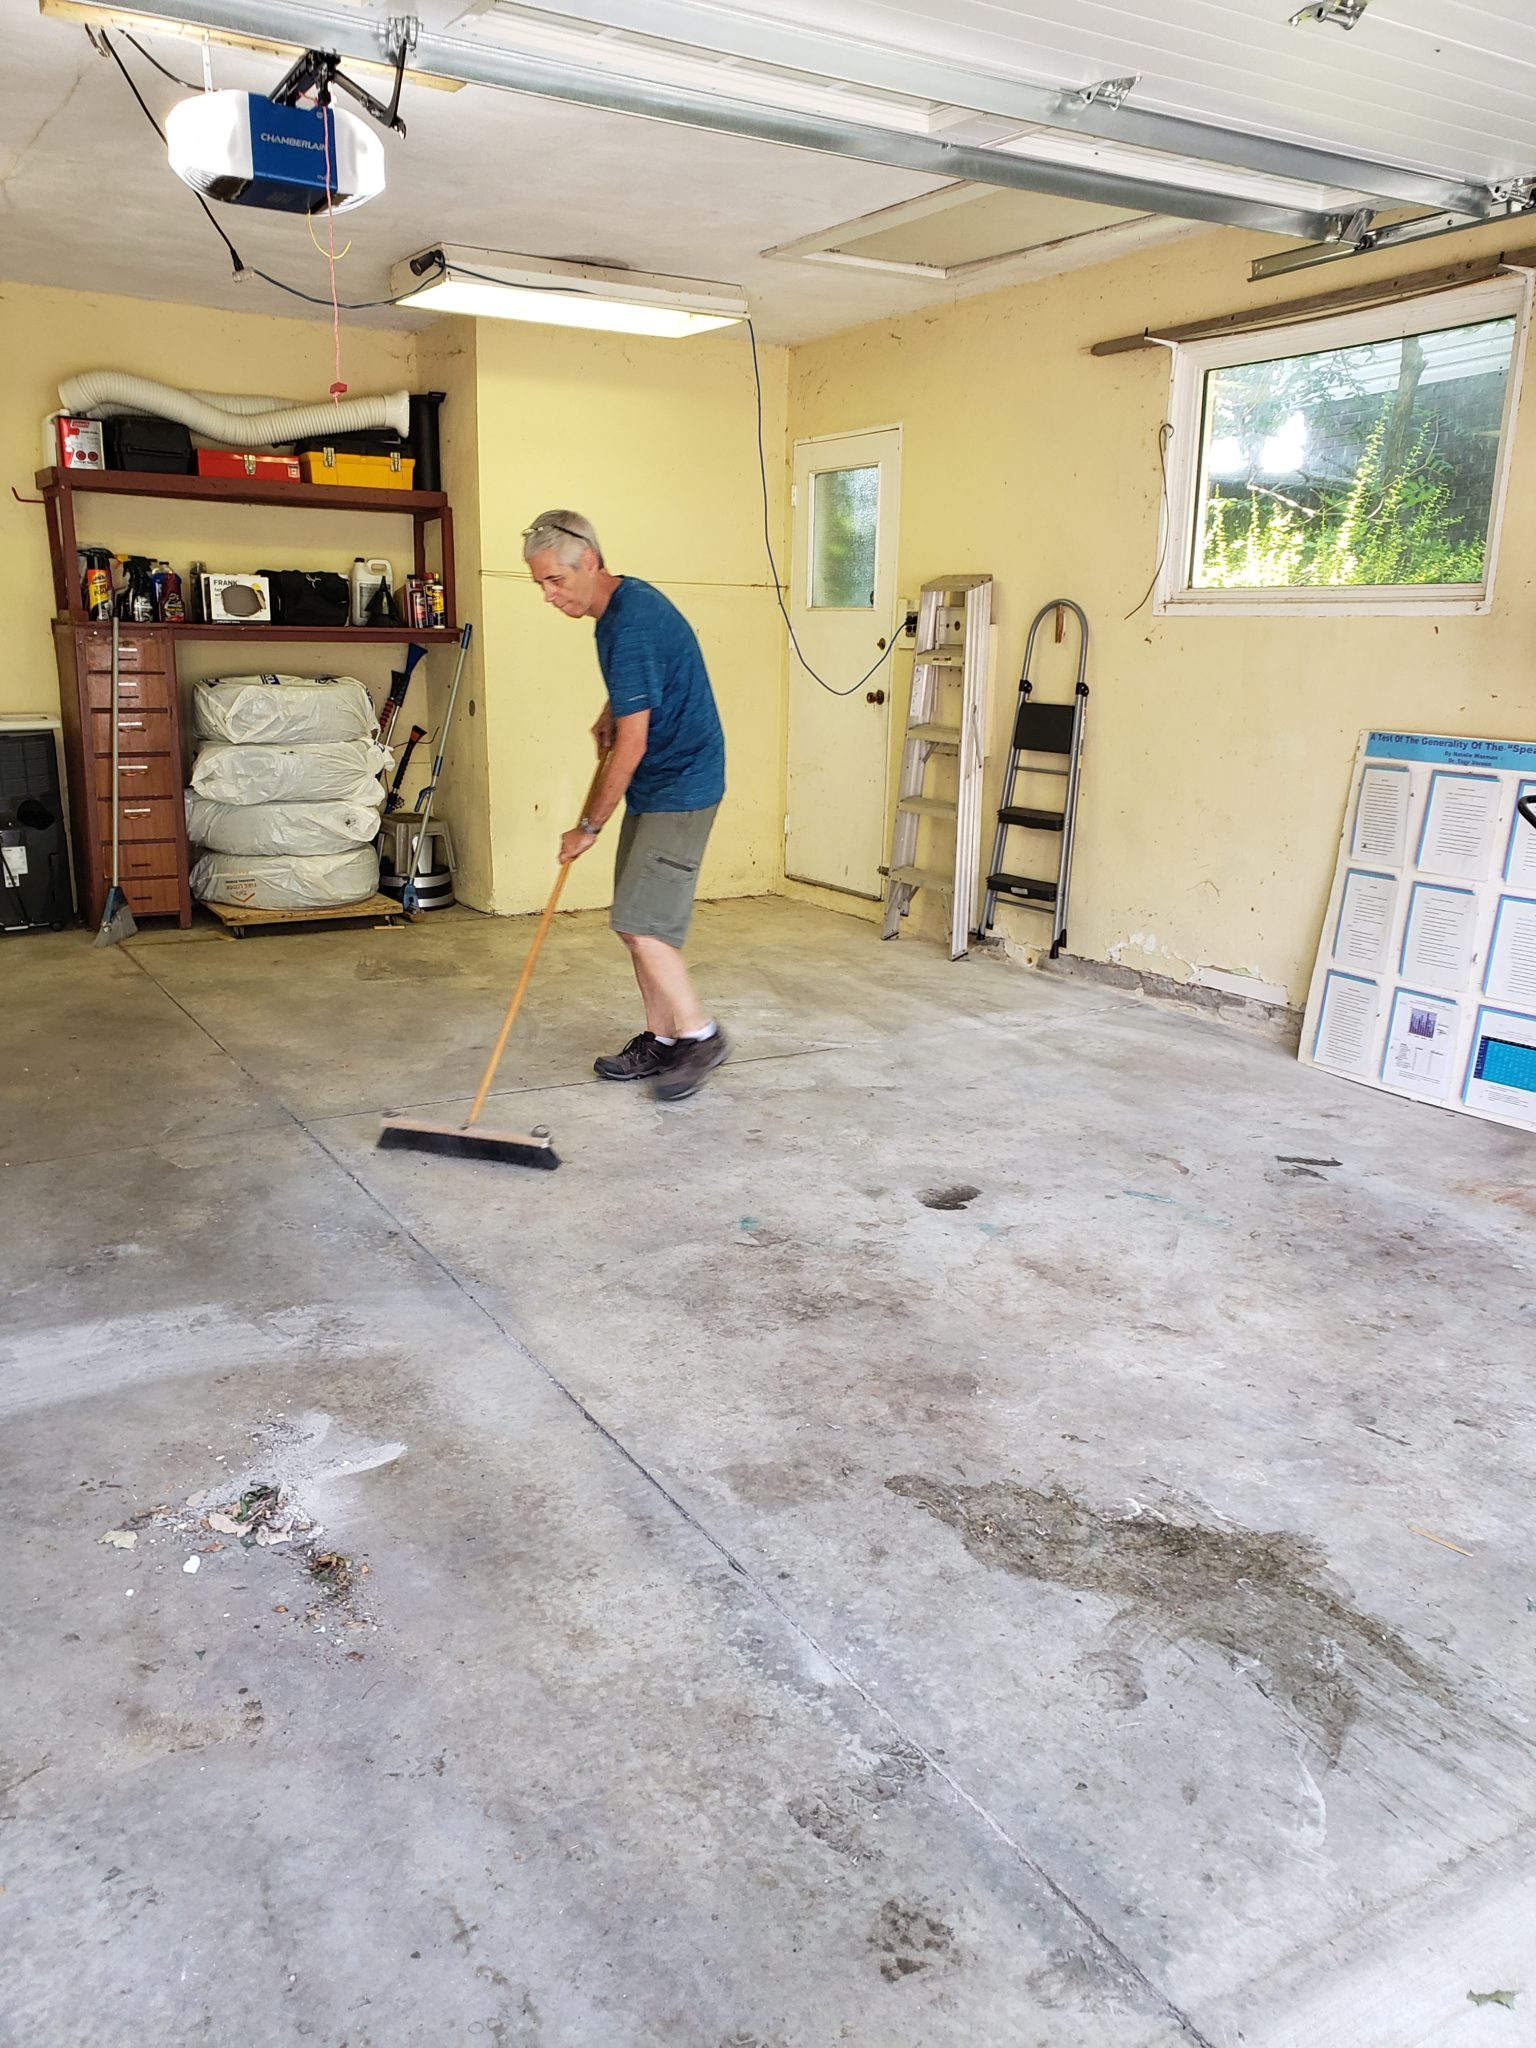 Garage area - After